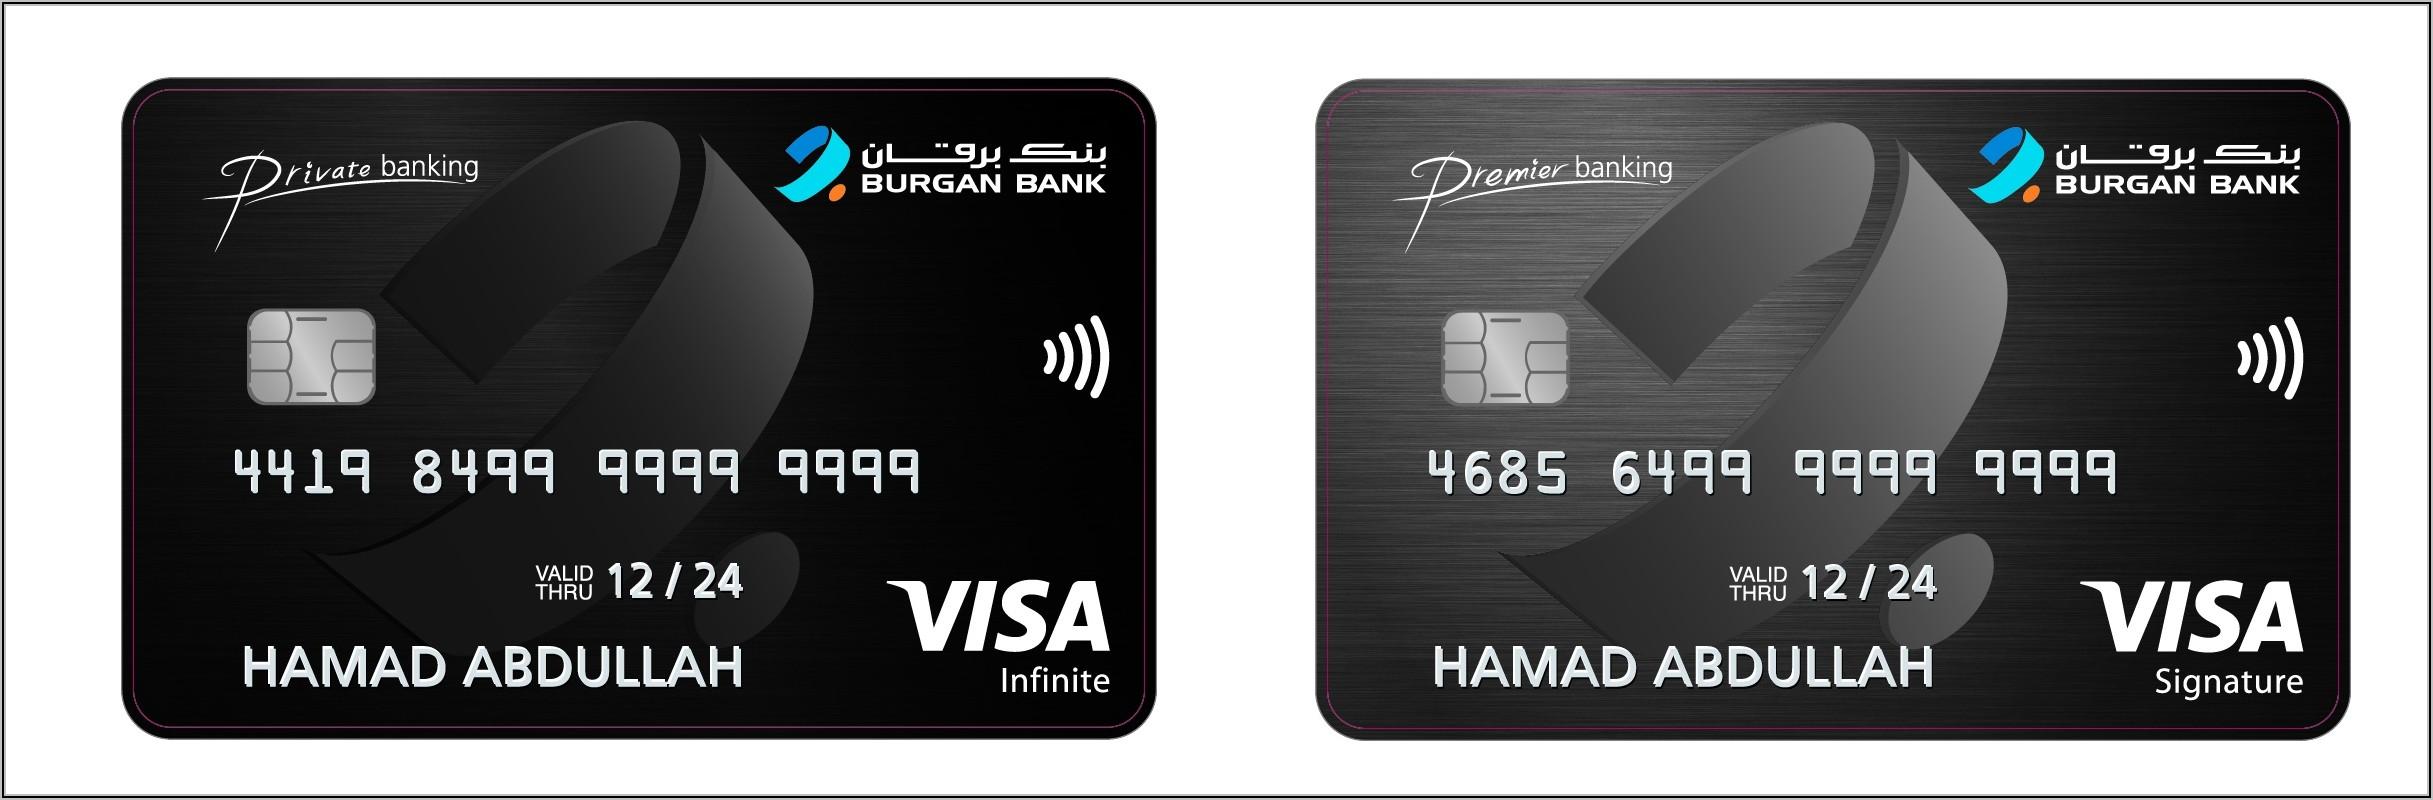 Fnb Business Platinum Card Benefits